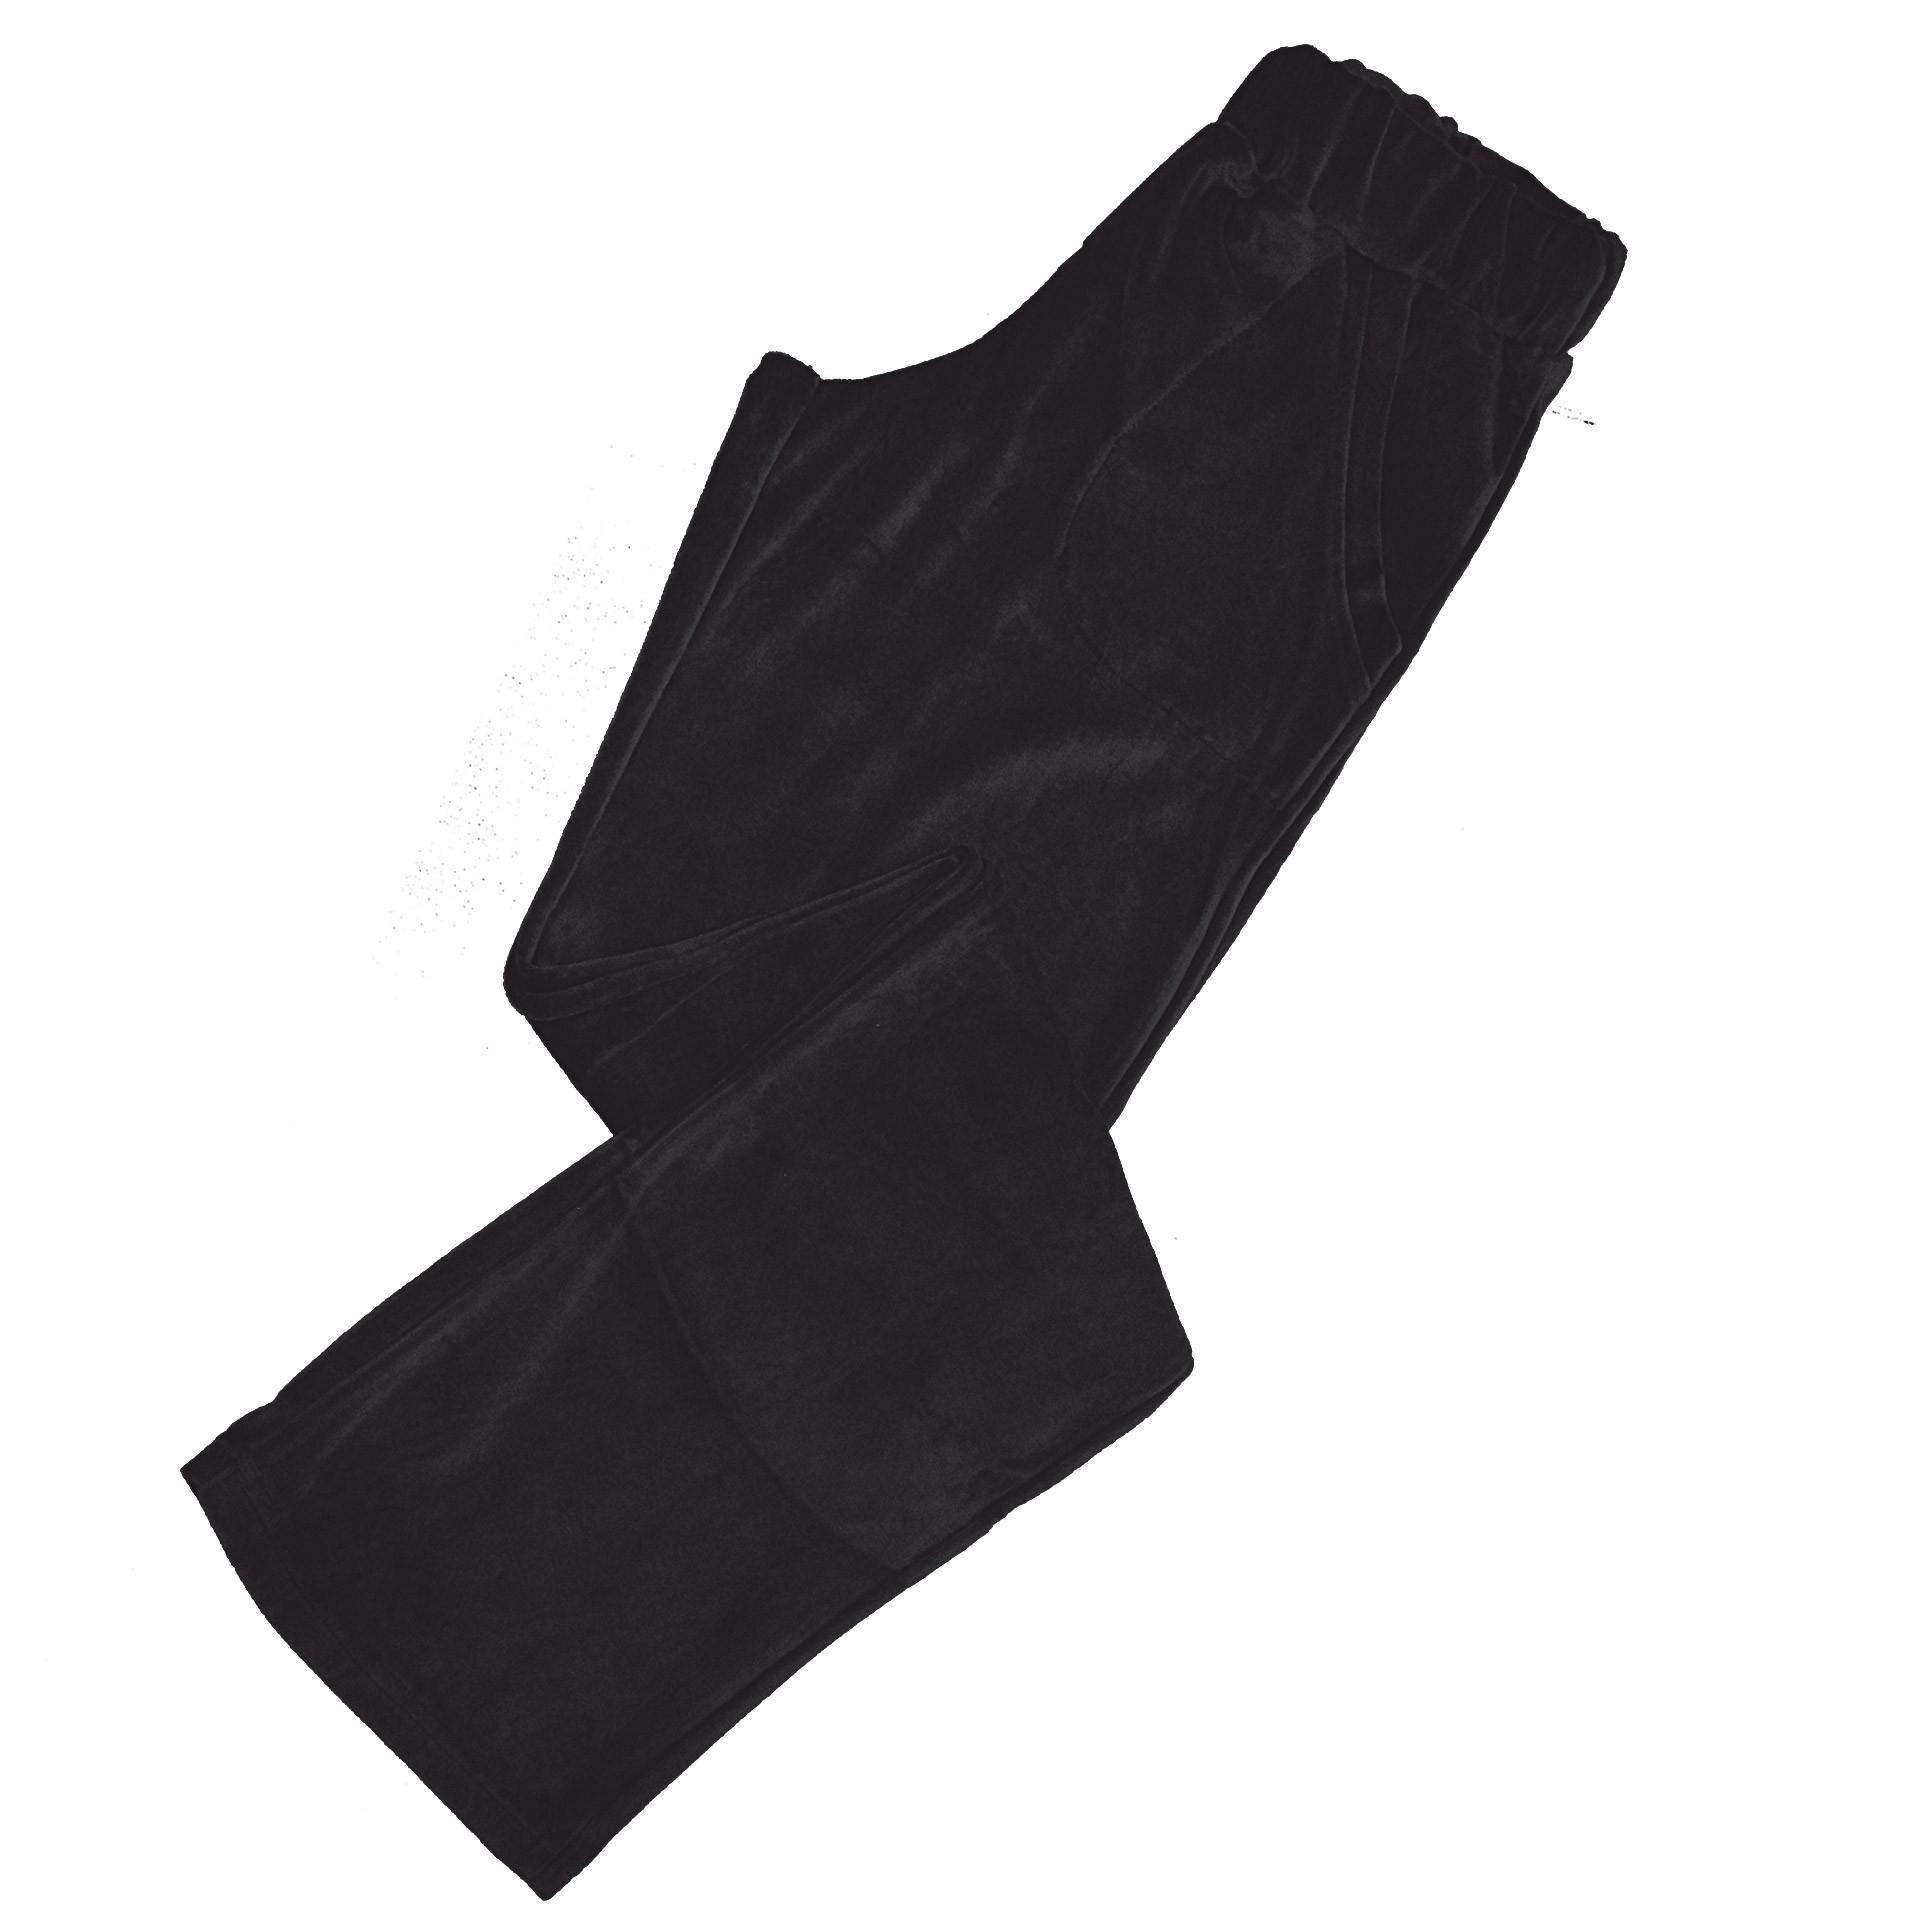 Luna μαύρο βελούδινο παντελόνι φόρμας 1014